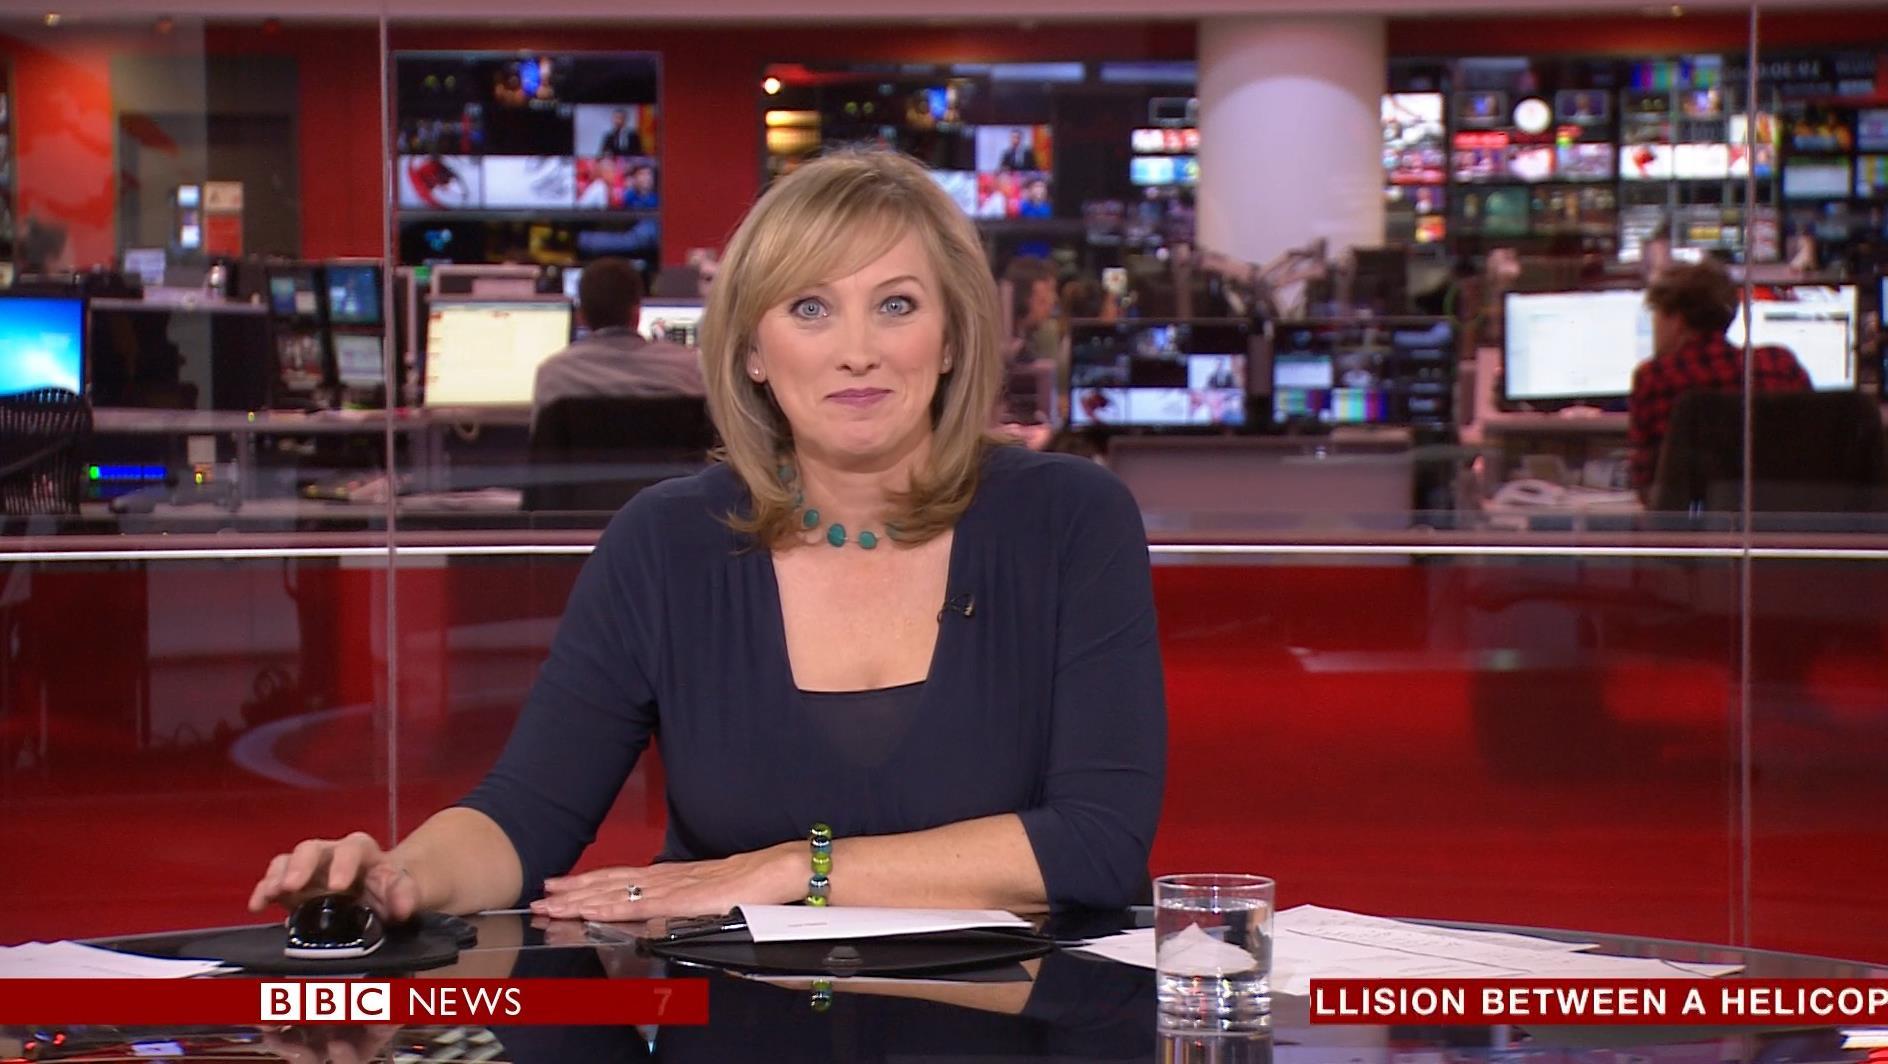 Martine Croxall - BBC News Presenter (4)